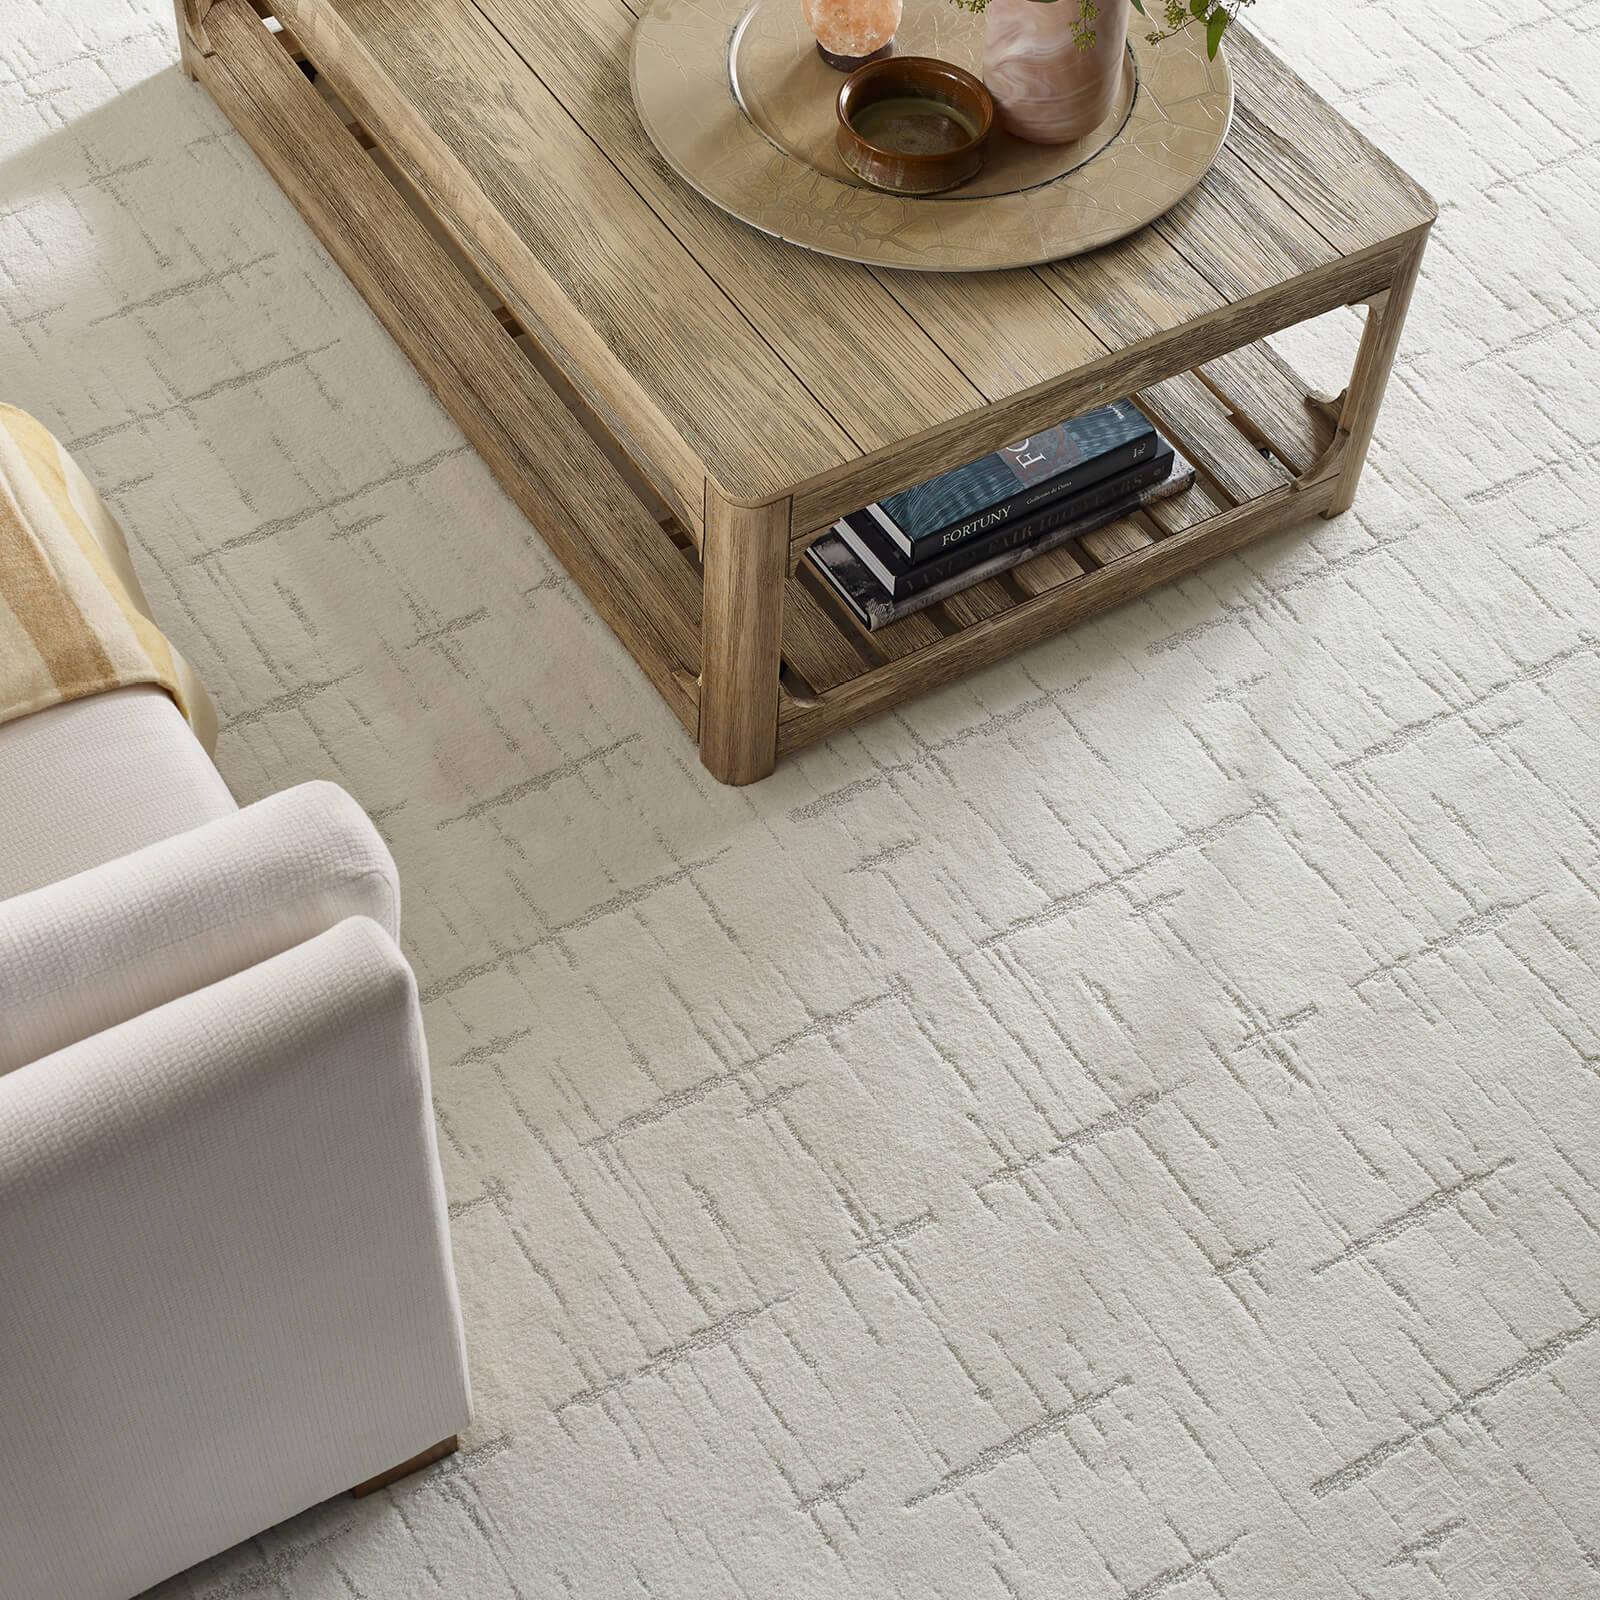 Carpet design | J/K Carpet Center, Inc